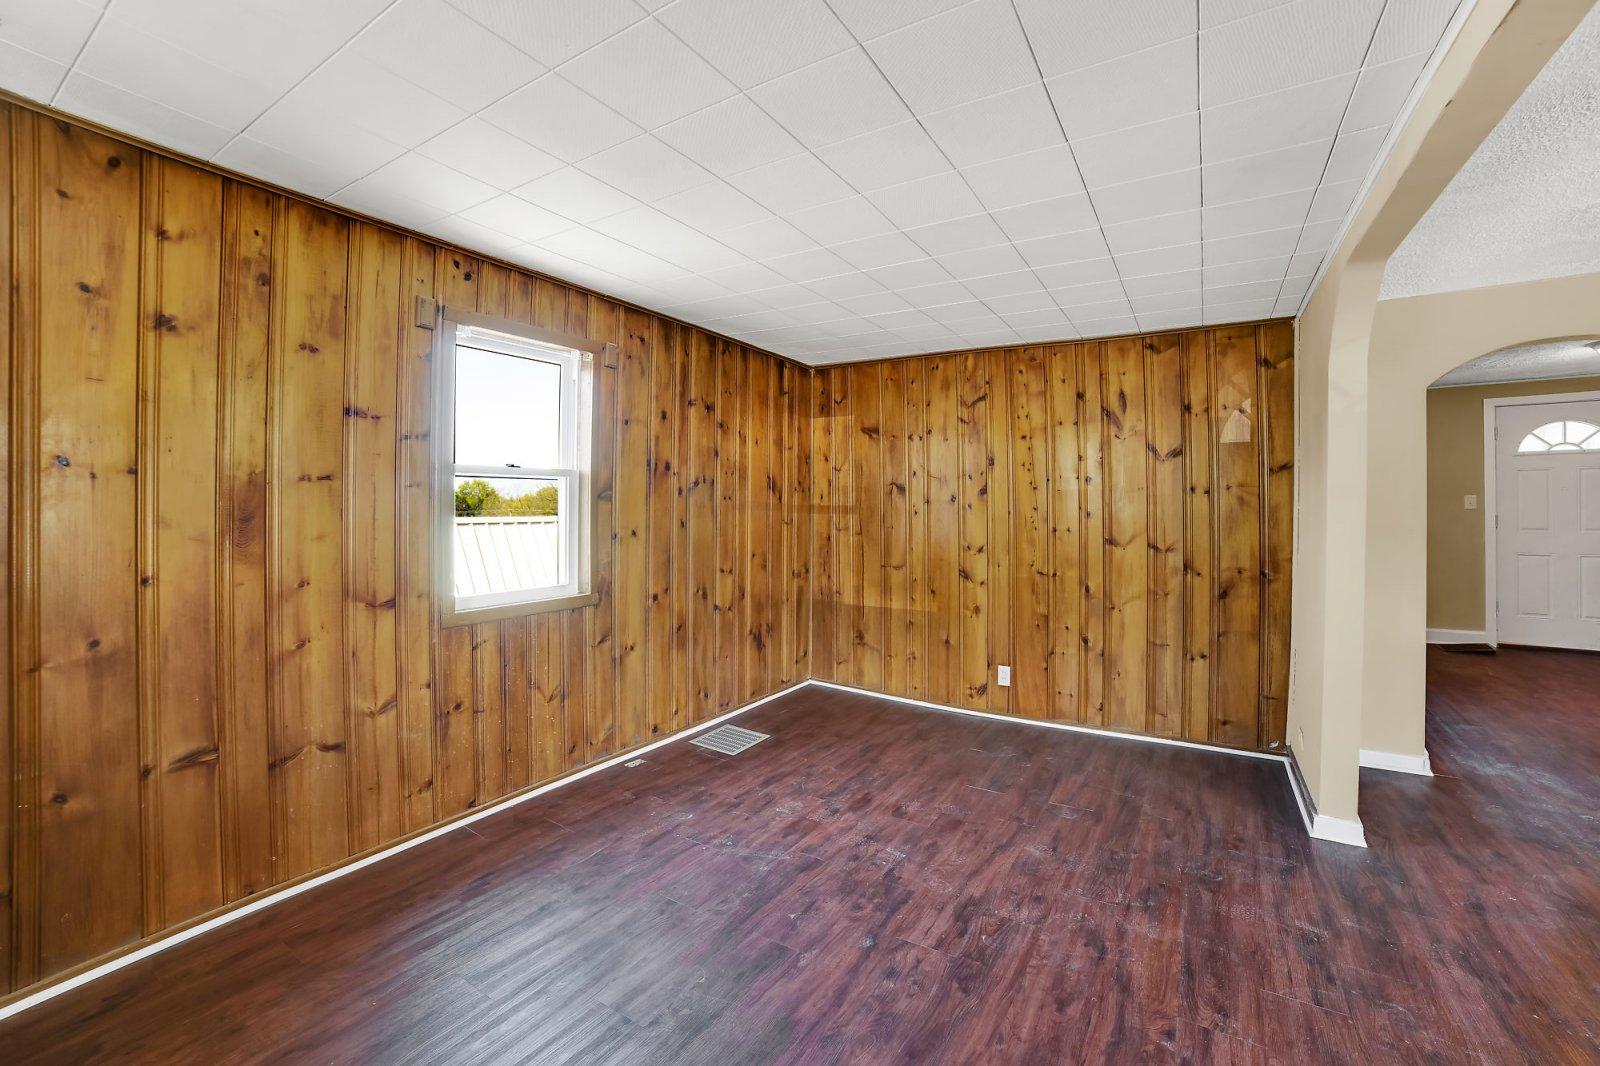 3430 Walnut St Harrisburg Pa 17109 Cr Property Group